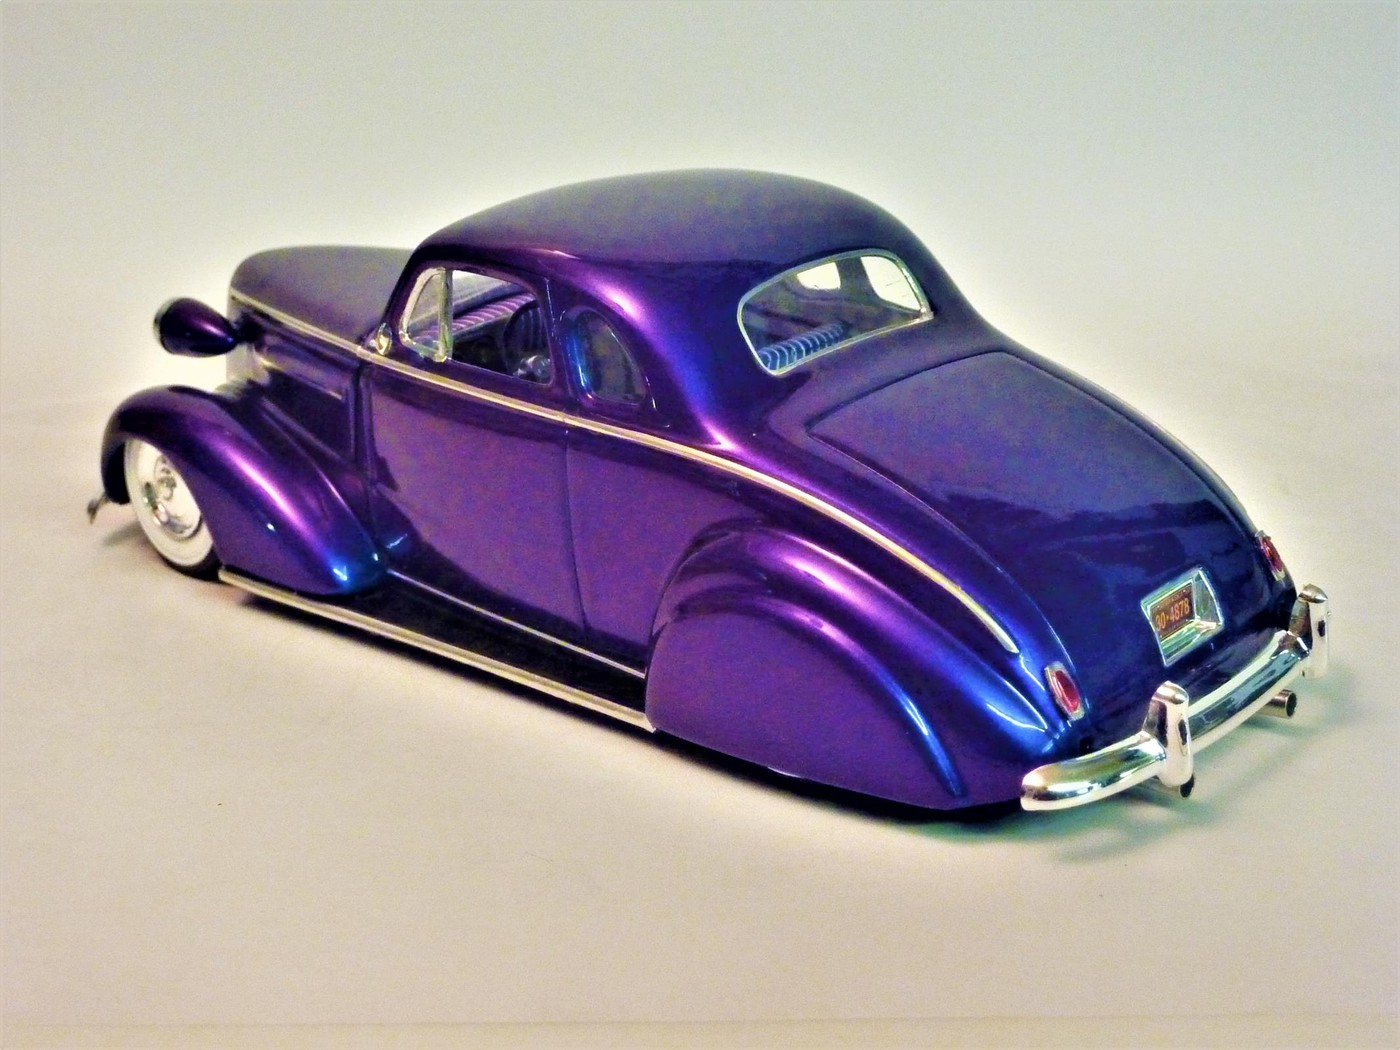 Projet Chevy 37 custom terminée  - Page 2 Photo62-vi